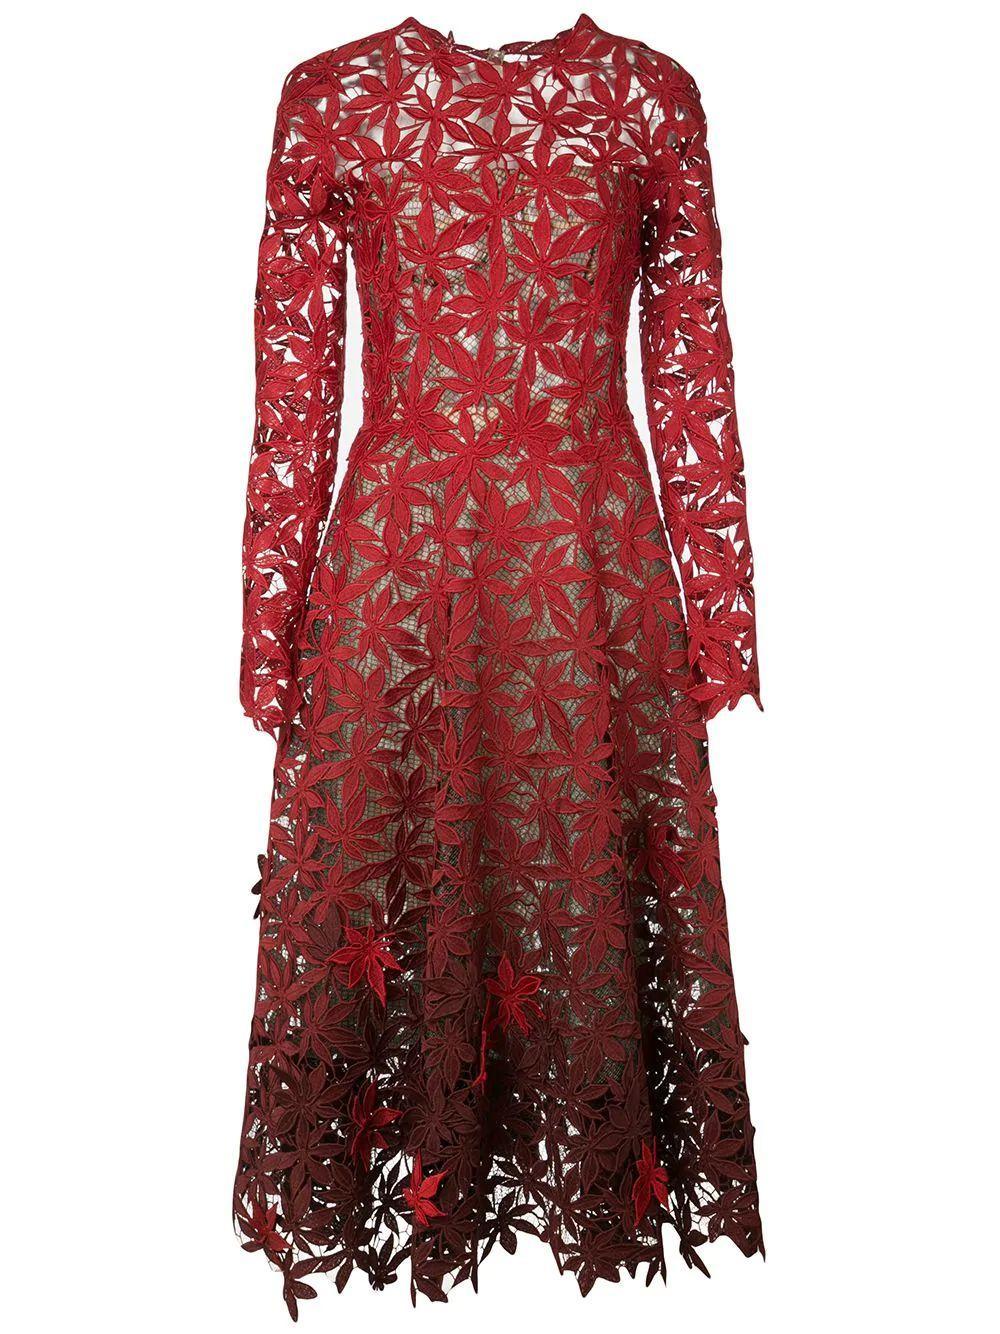 Long Sleeve Lace App.Midi Dress Item # 20RE653MLG